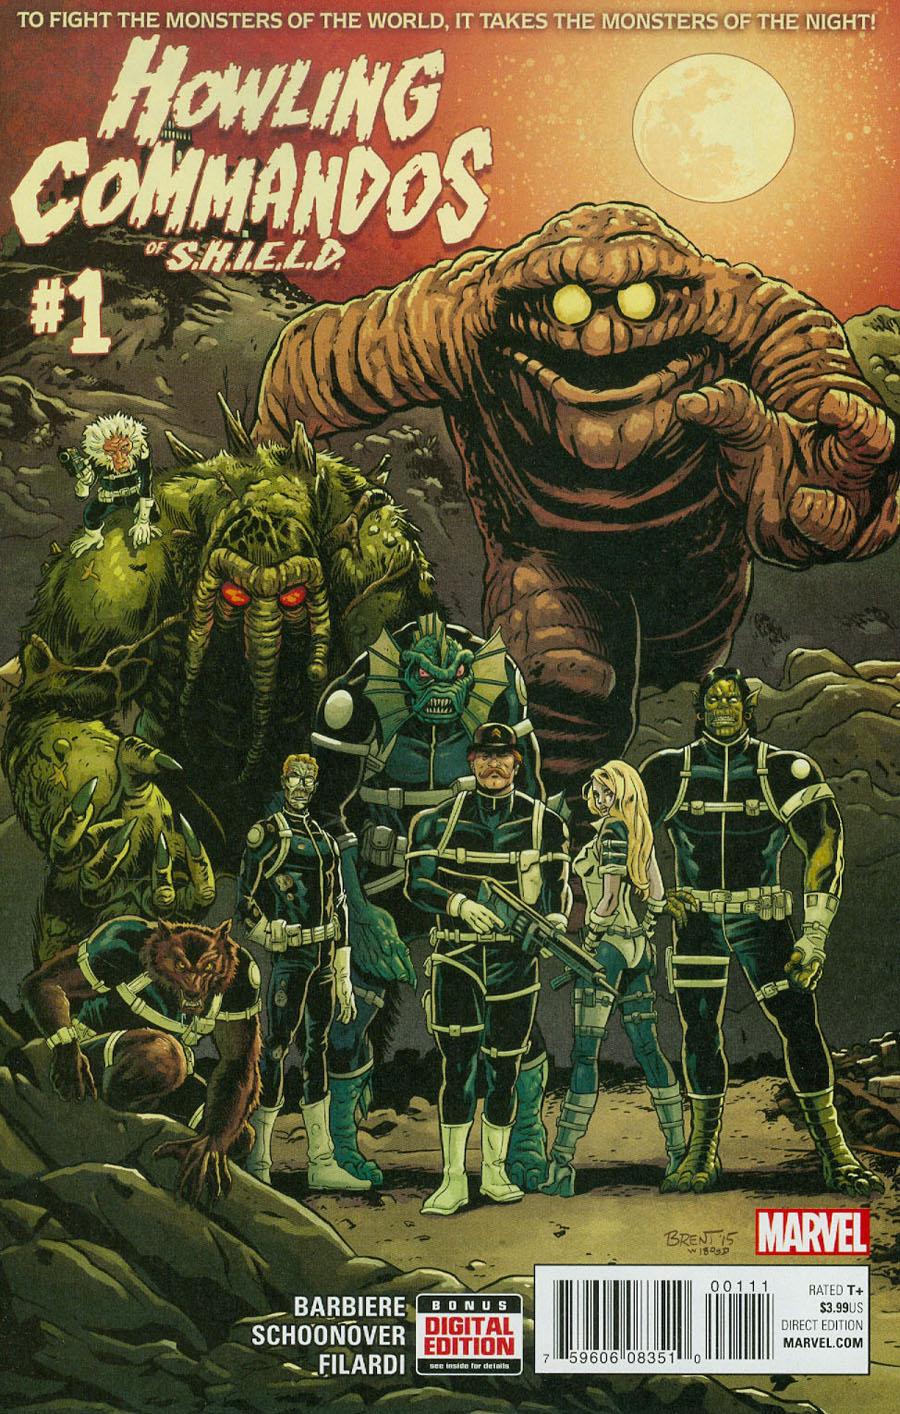 Howling Commandos Of S.H.I.E.L.D. #1 Cover A Regular Brent Schoonover Cover